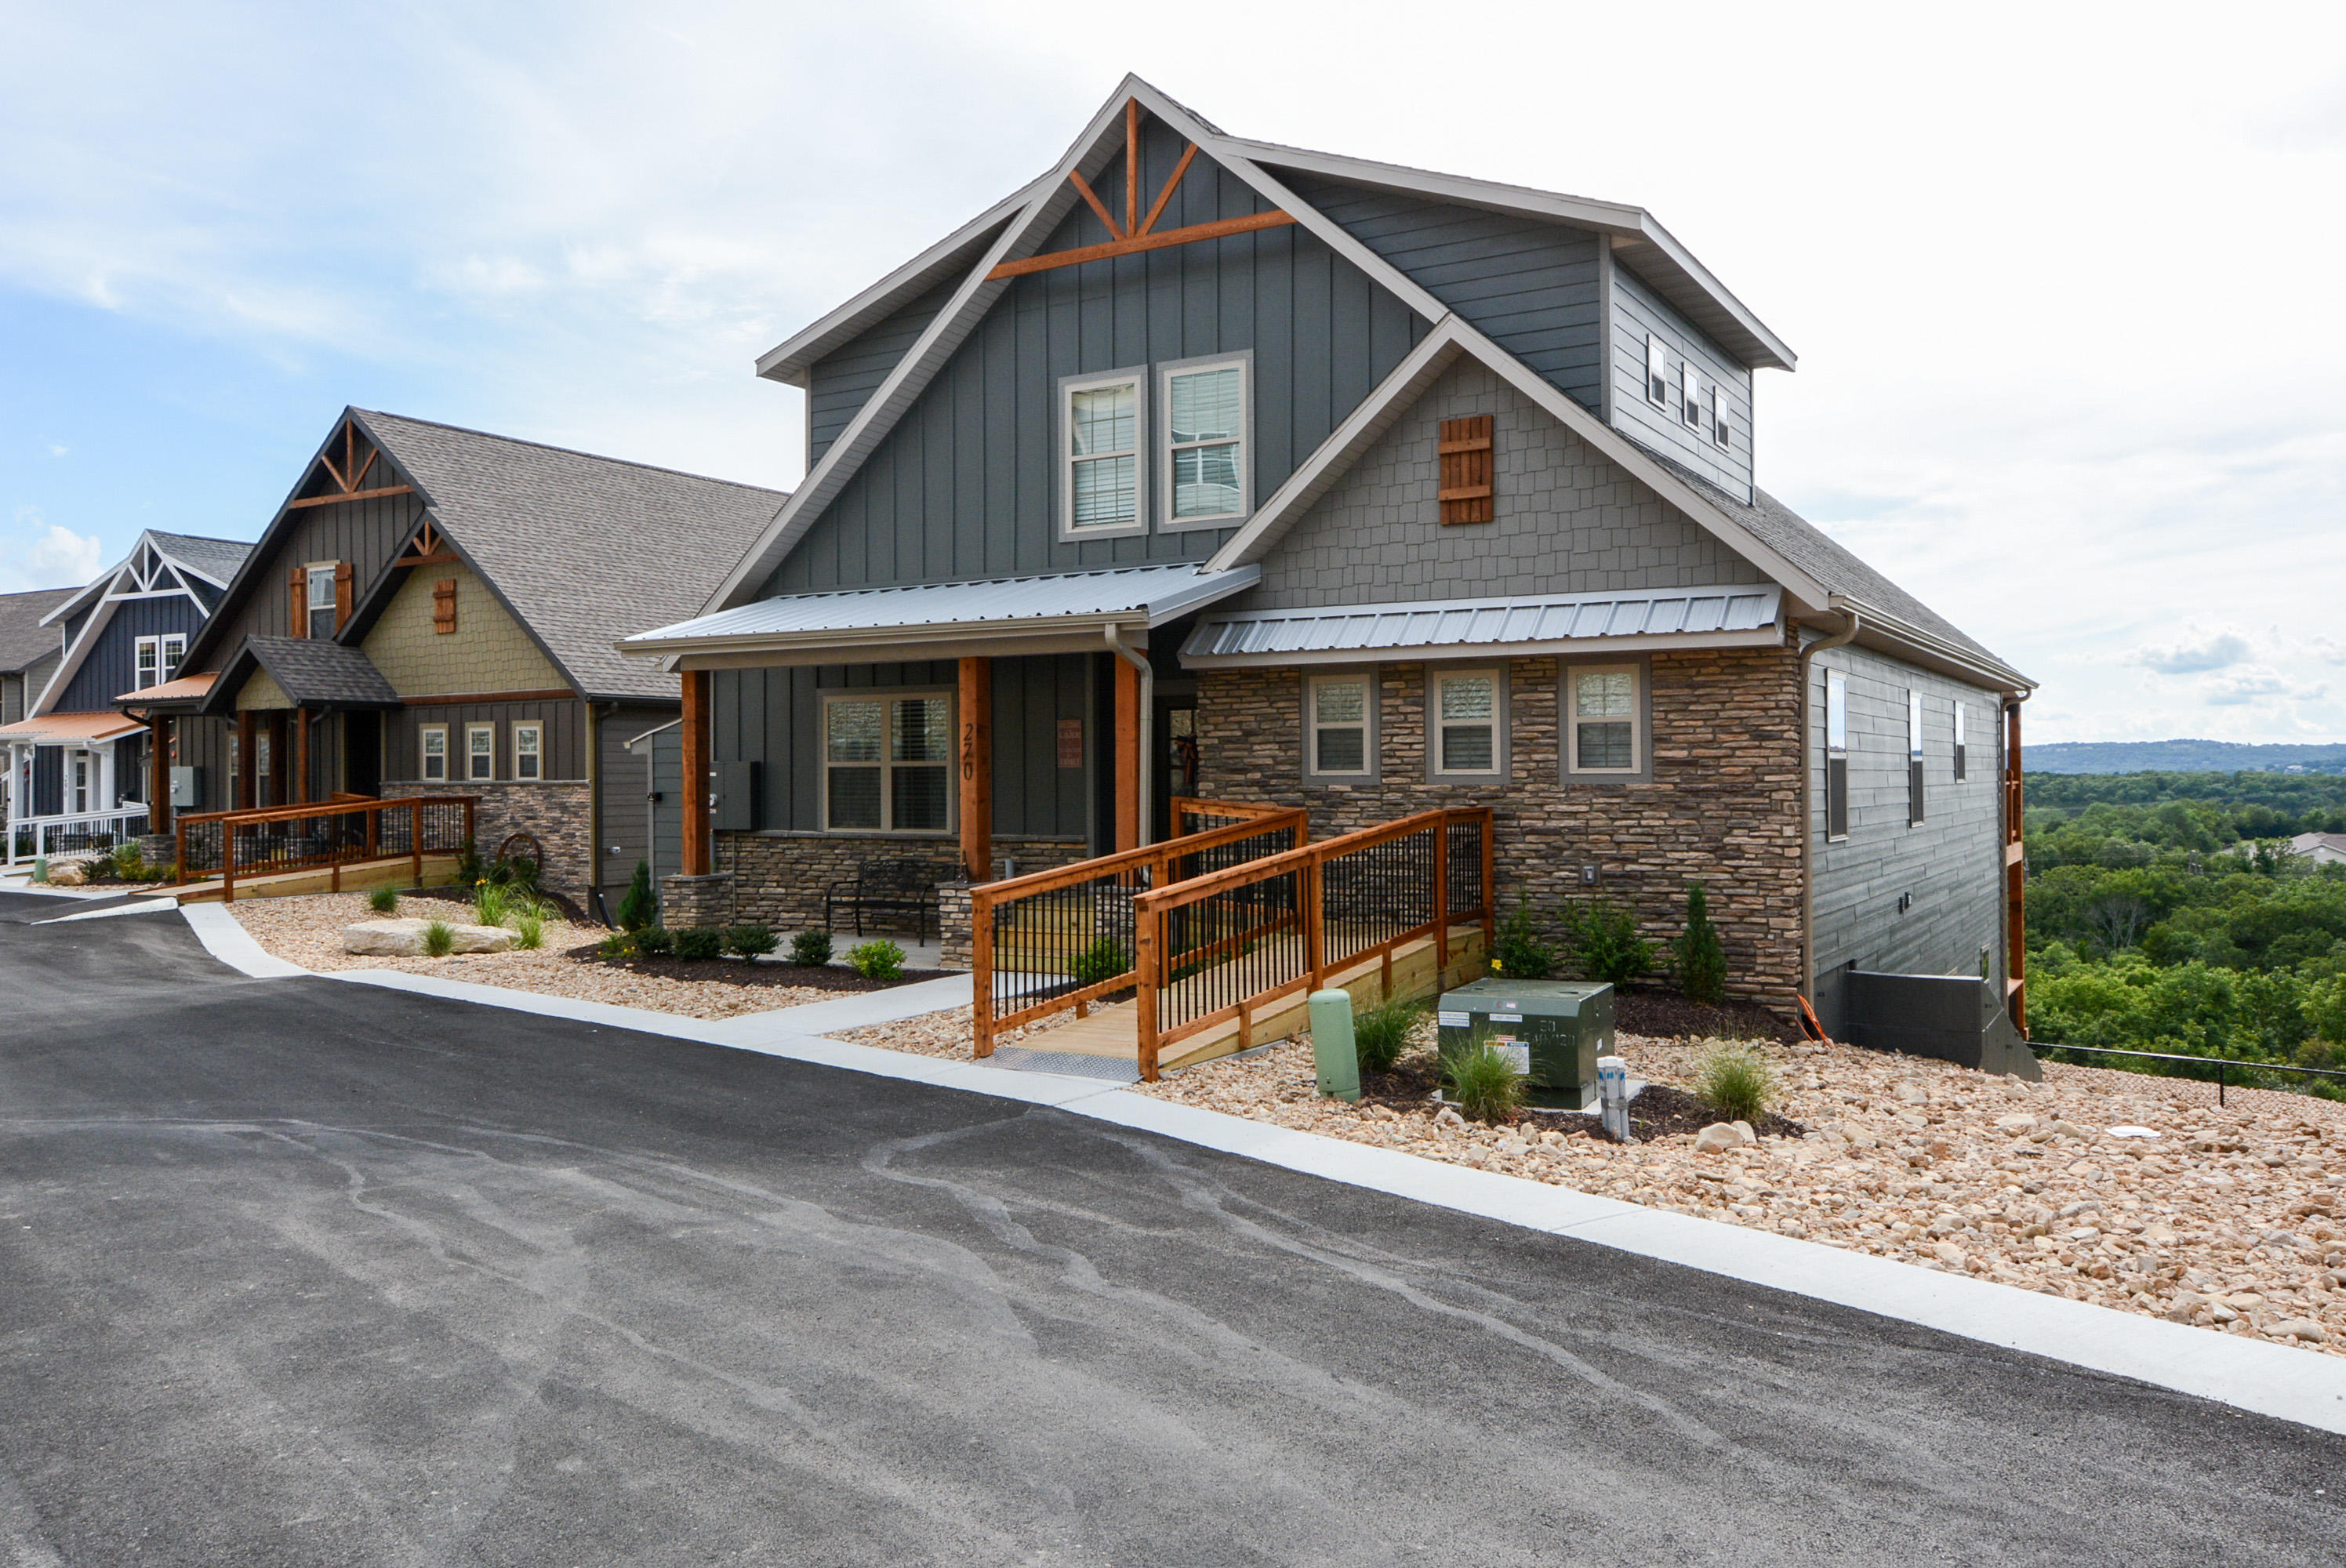 270 Chateau Cove Drive Branson, MO 65616